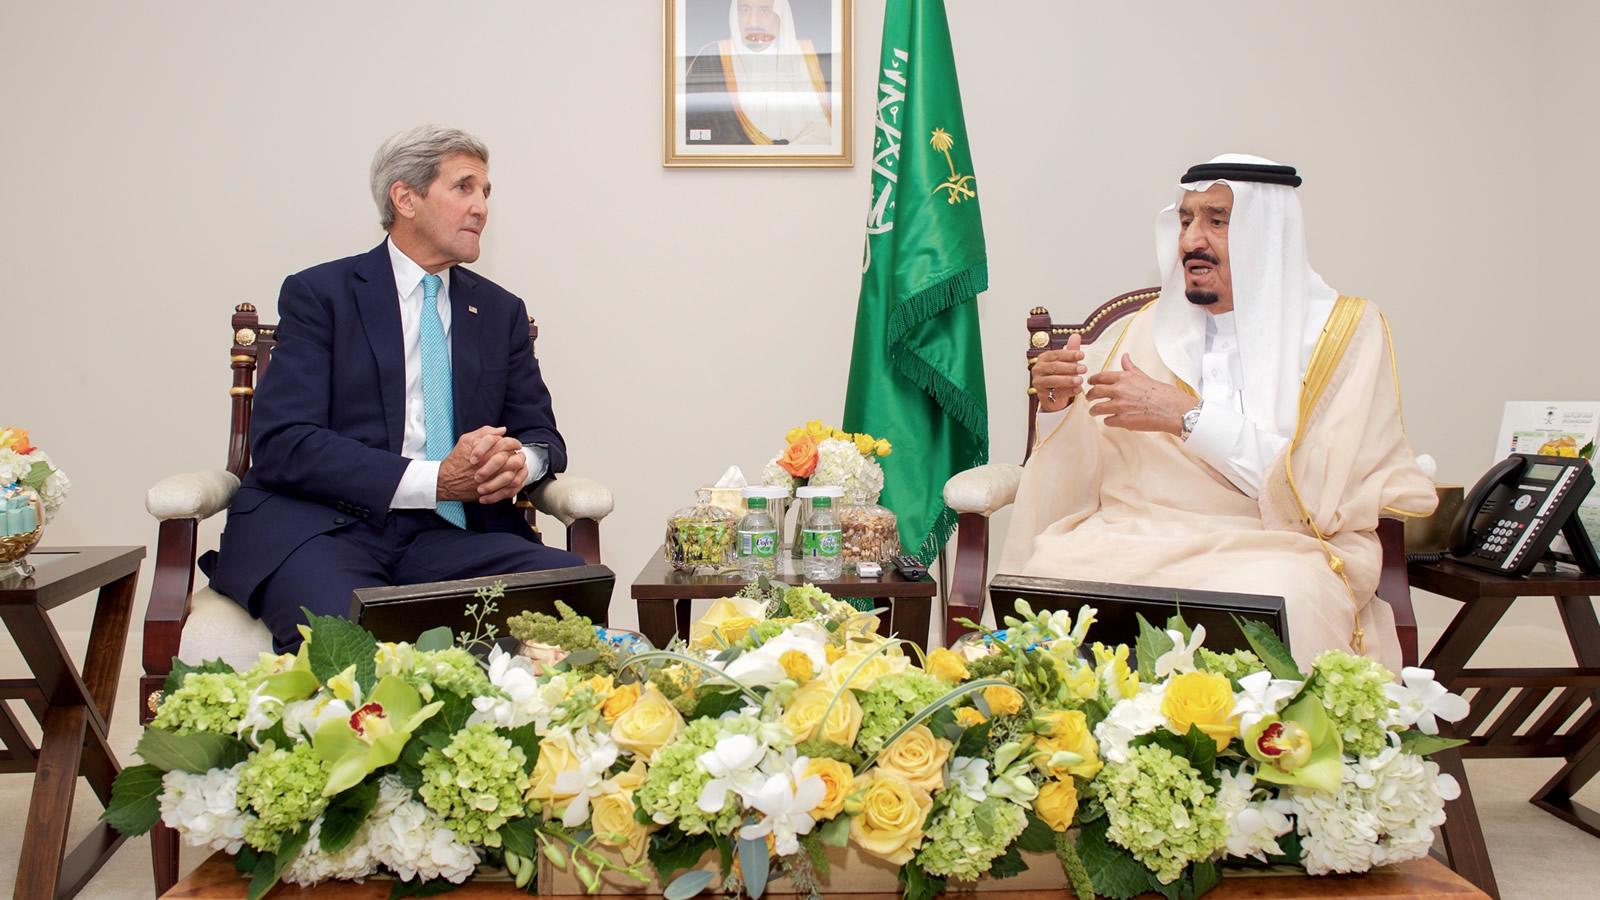 John Kerry and King Salman bin Abdul Aziz Talking